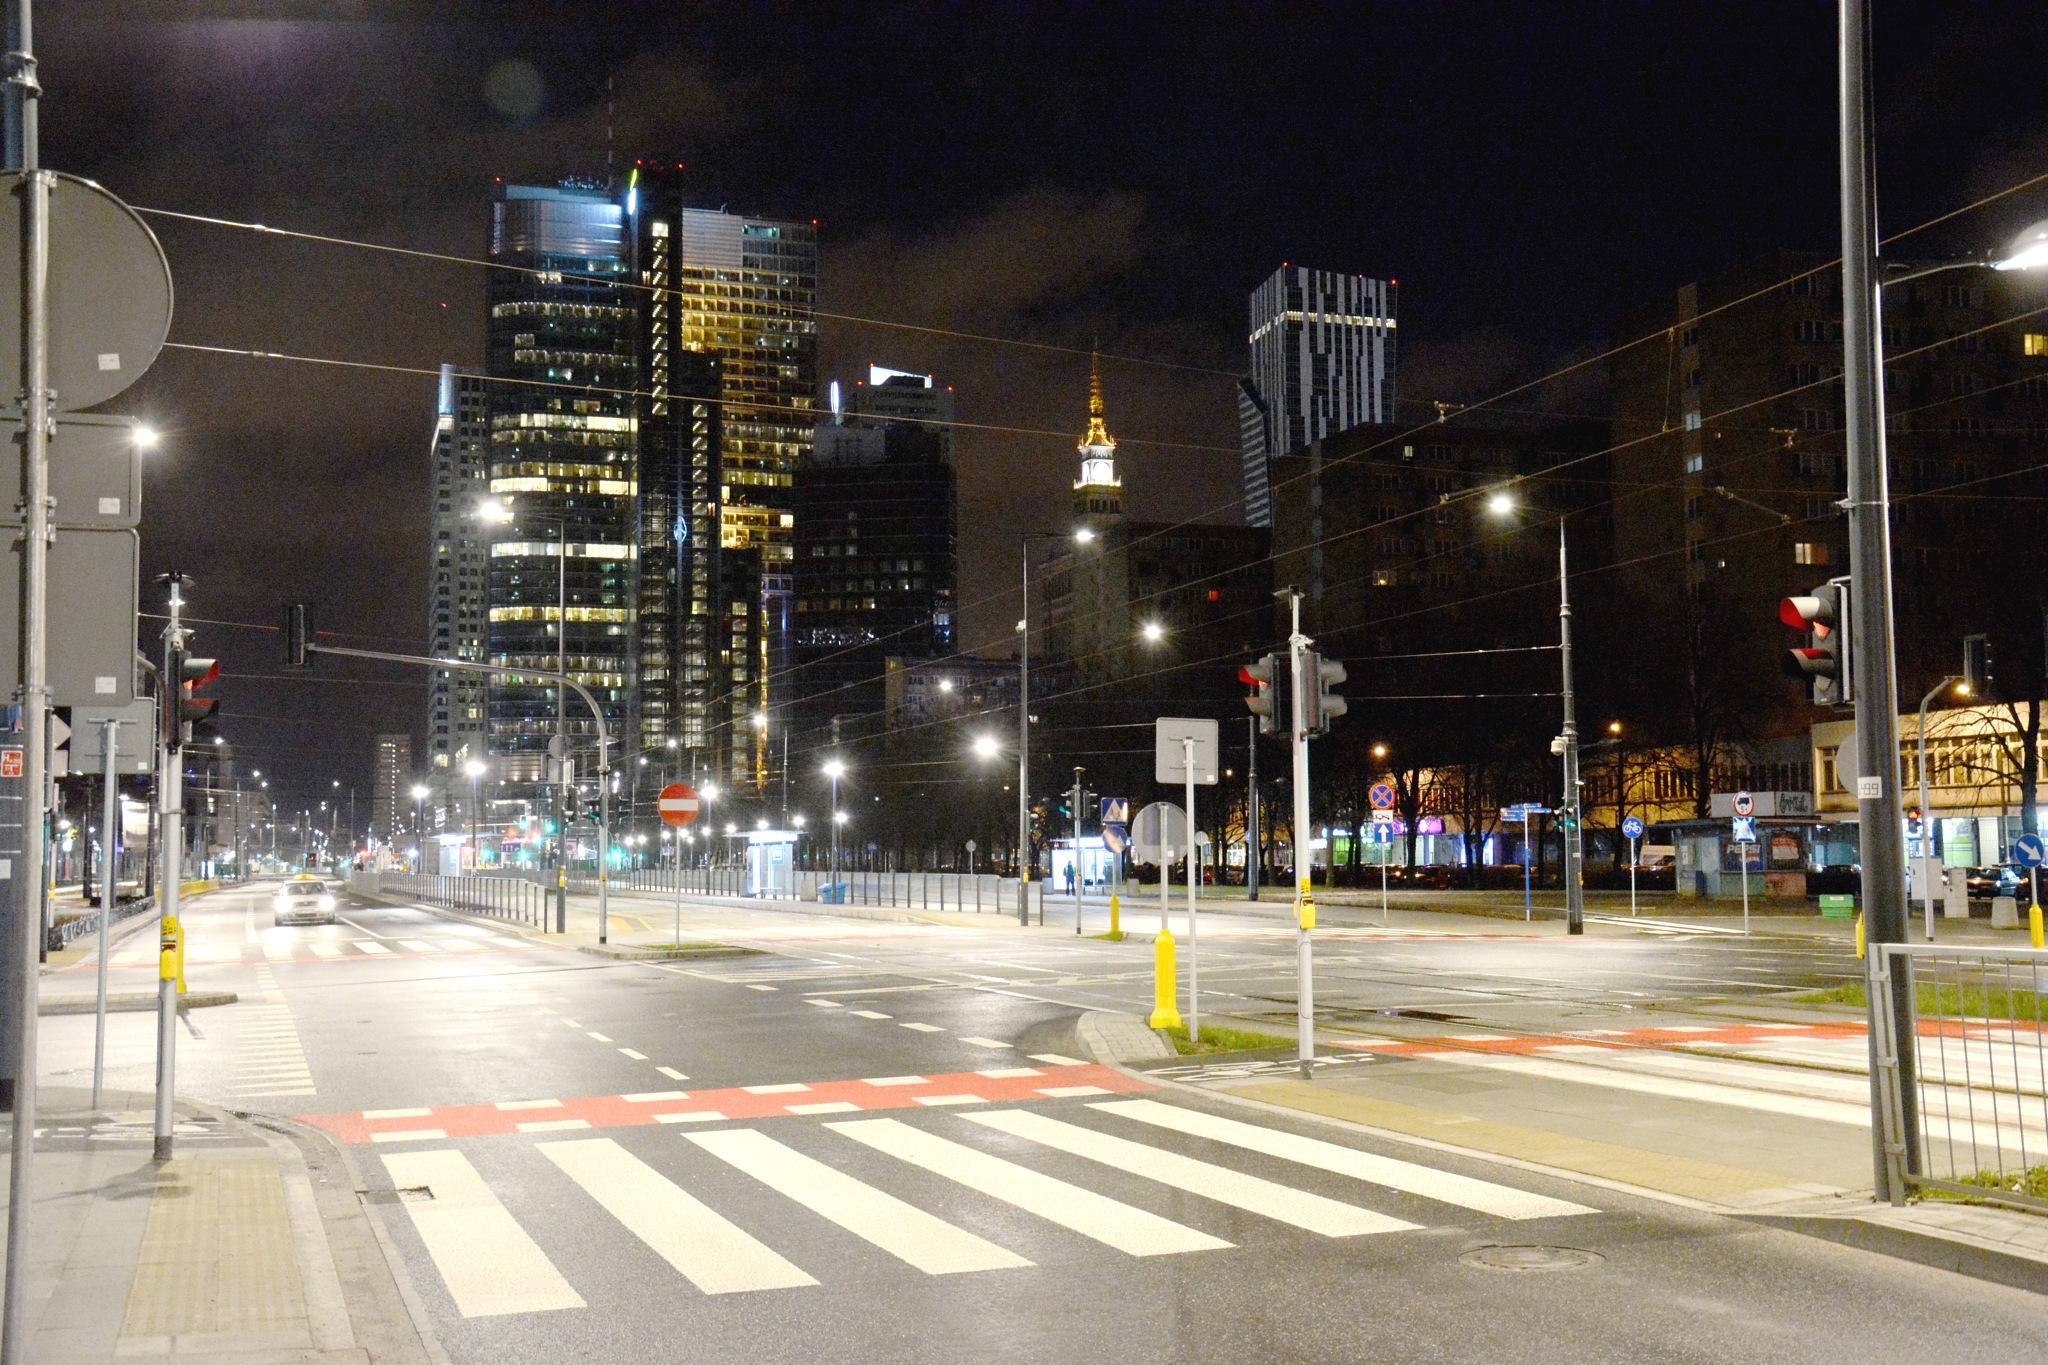 Warsaw city center by night by Bartek Stachyra